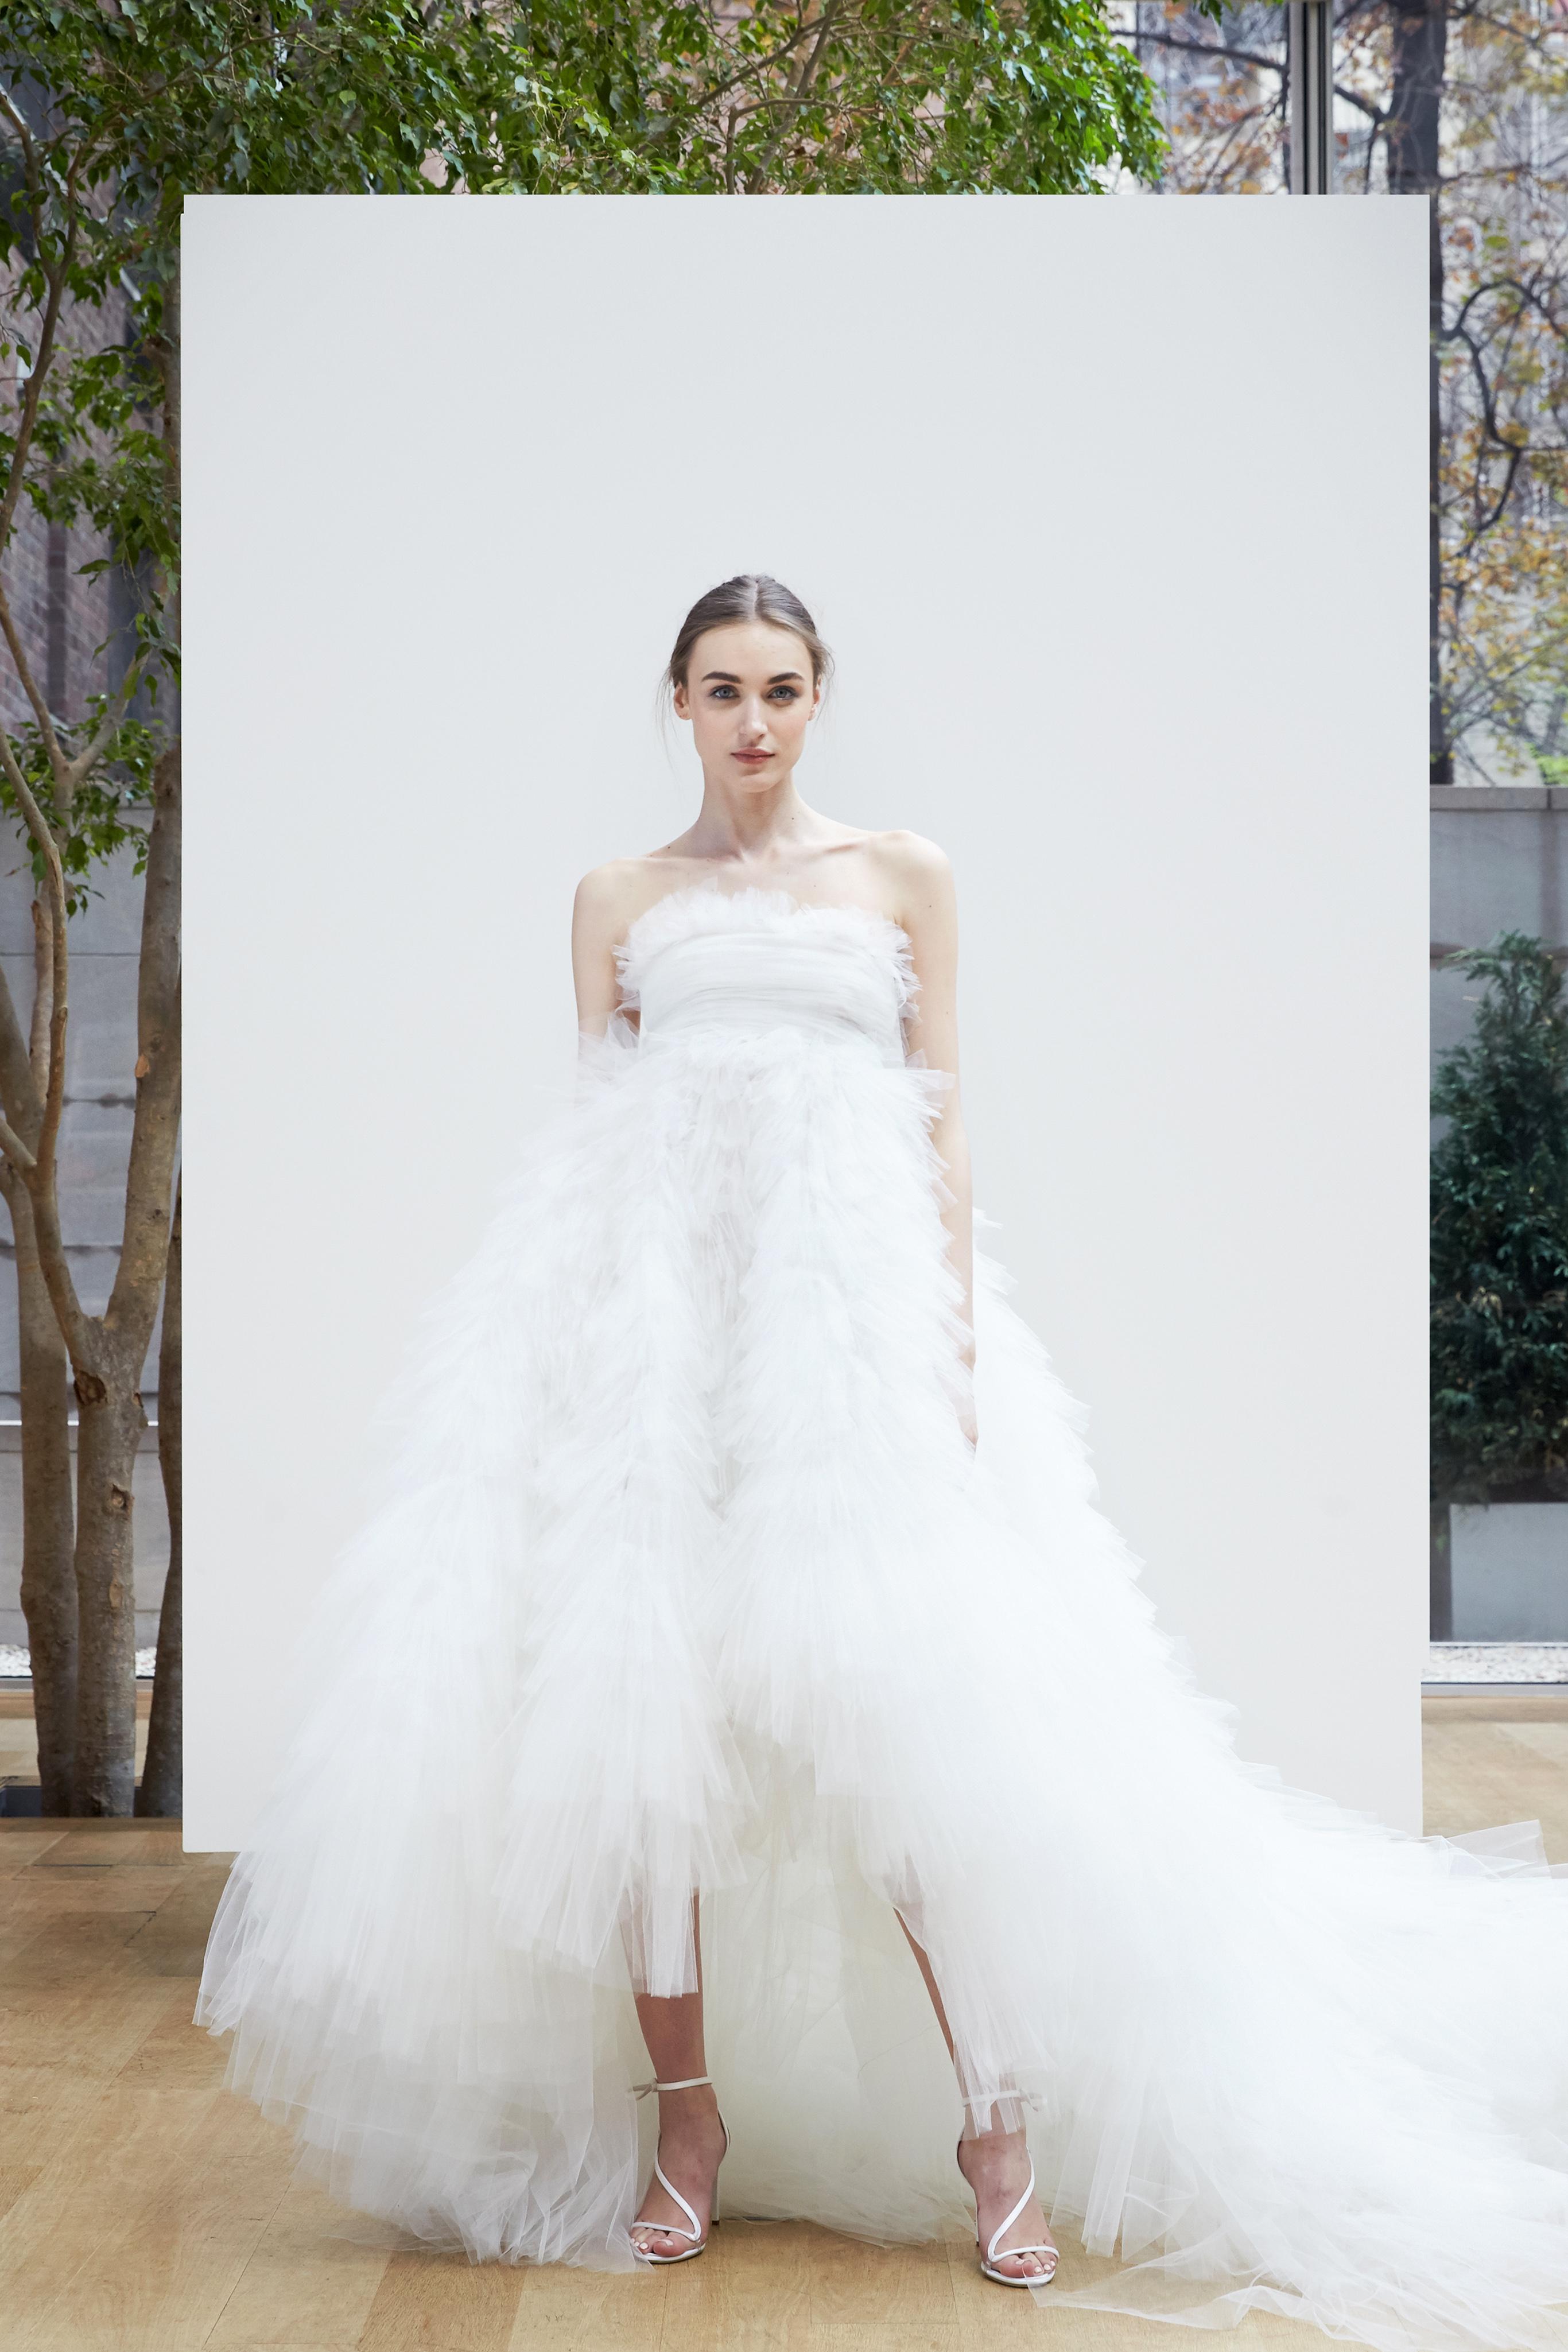 Oscar de la Renta Spring 2018 Wedding Dress Collection